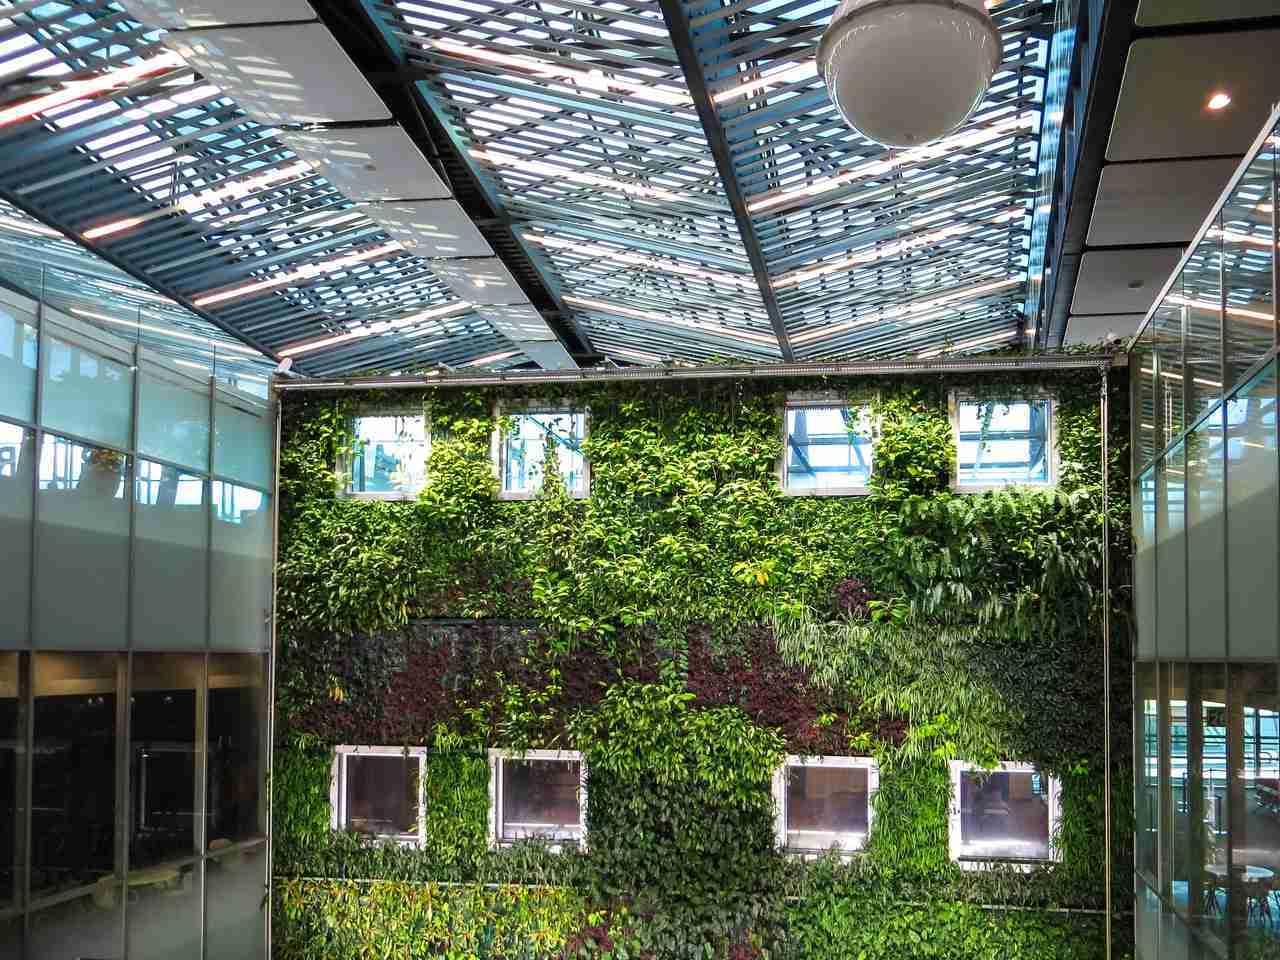 plants growing on wall indoor